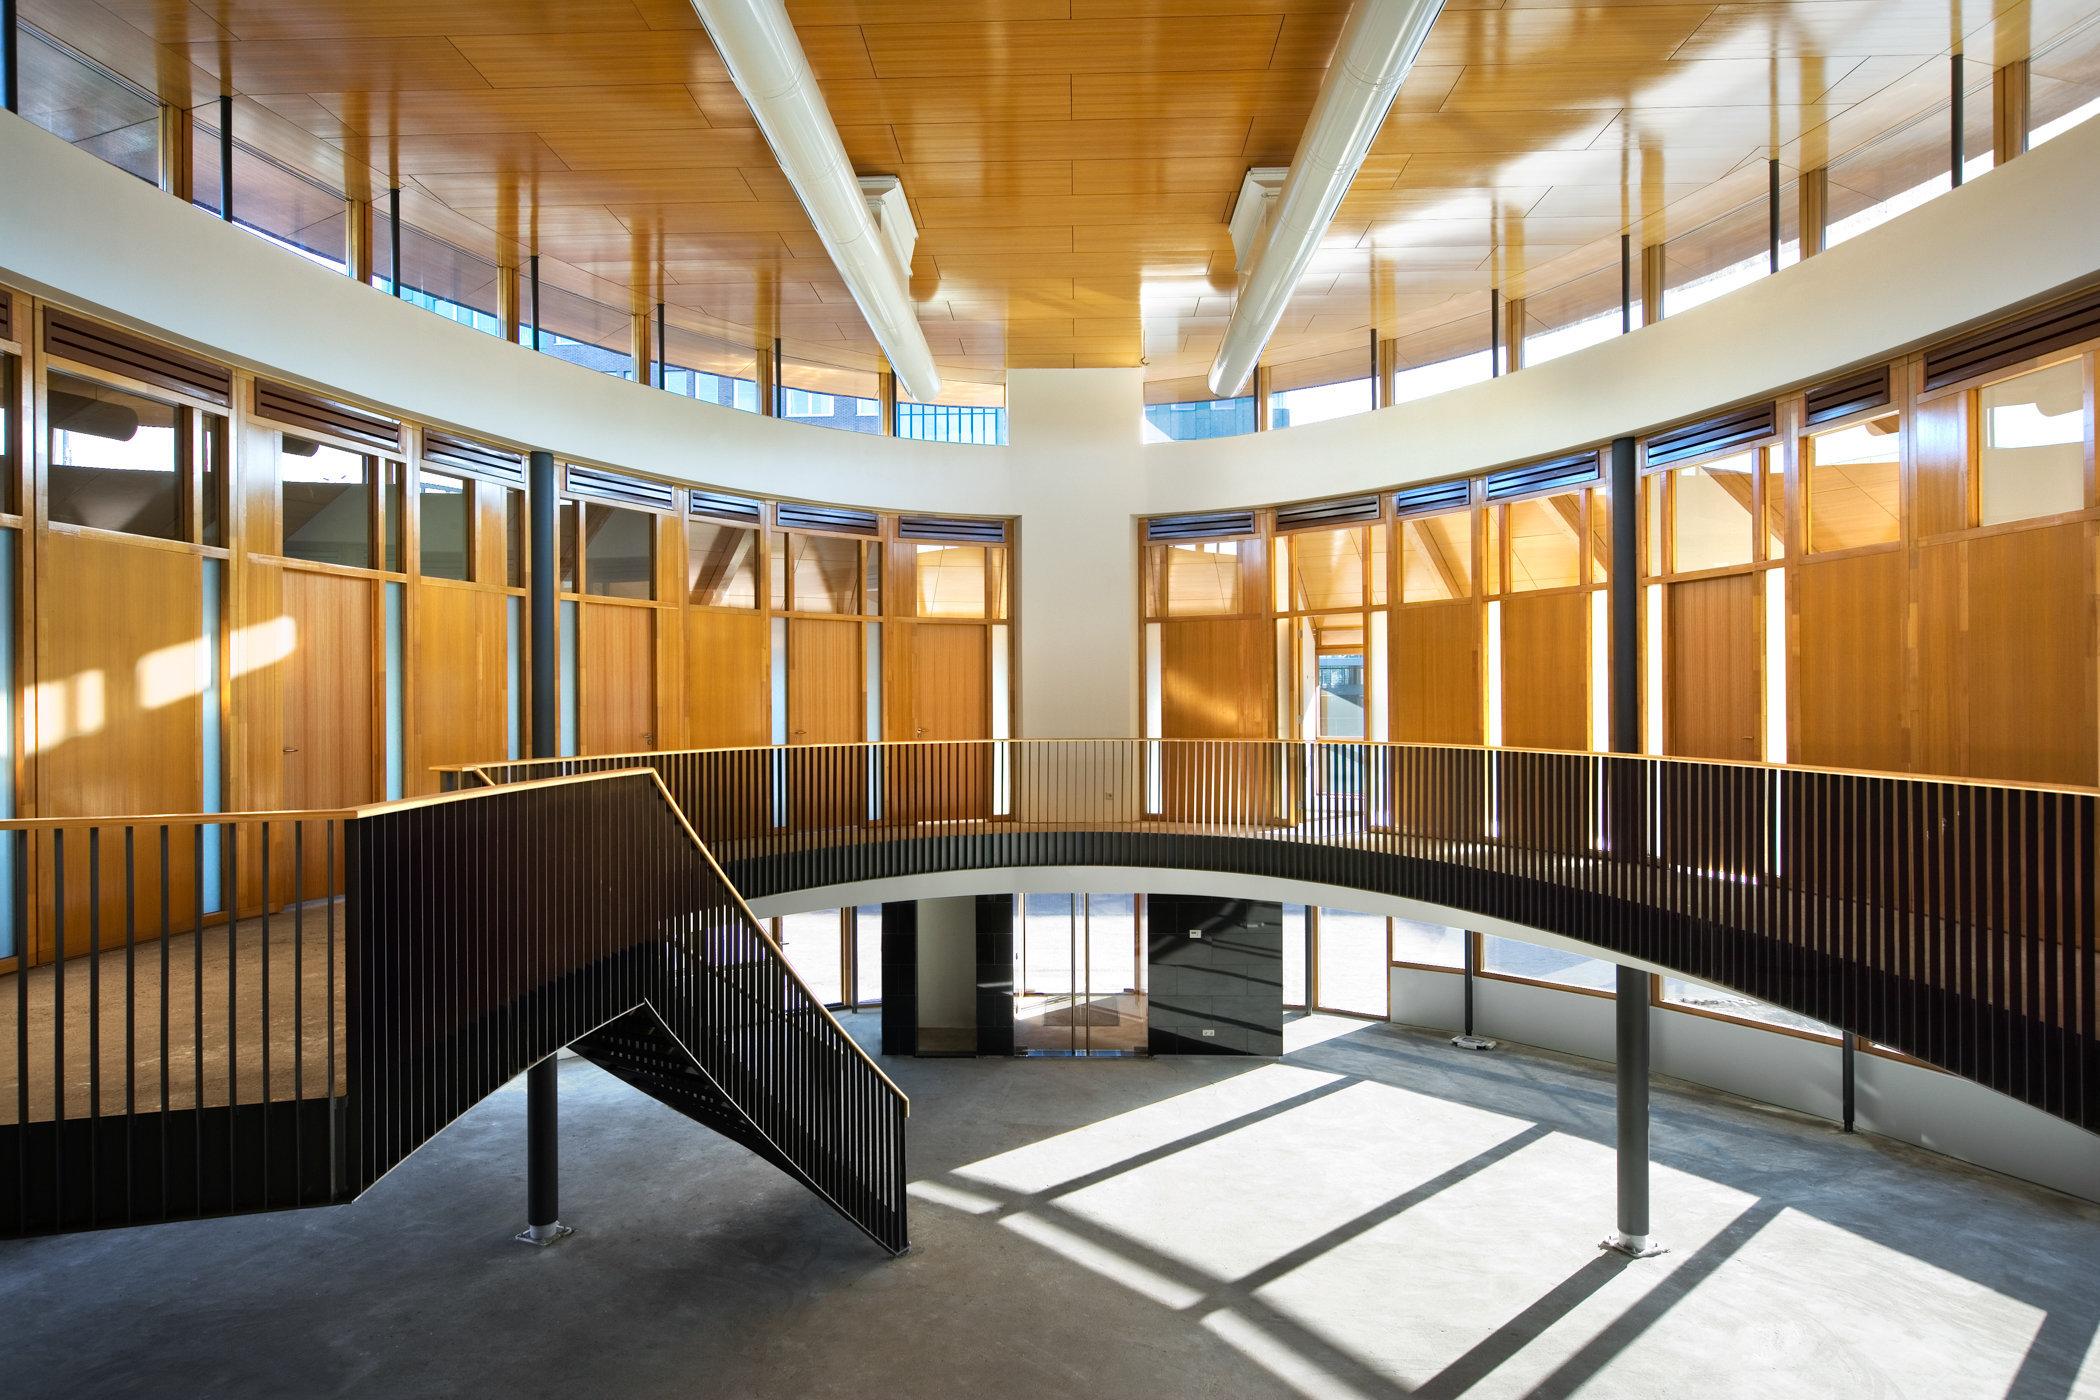 Pavilion Stadspark, Amstelveen by Rijnboutt Architects